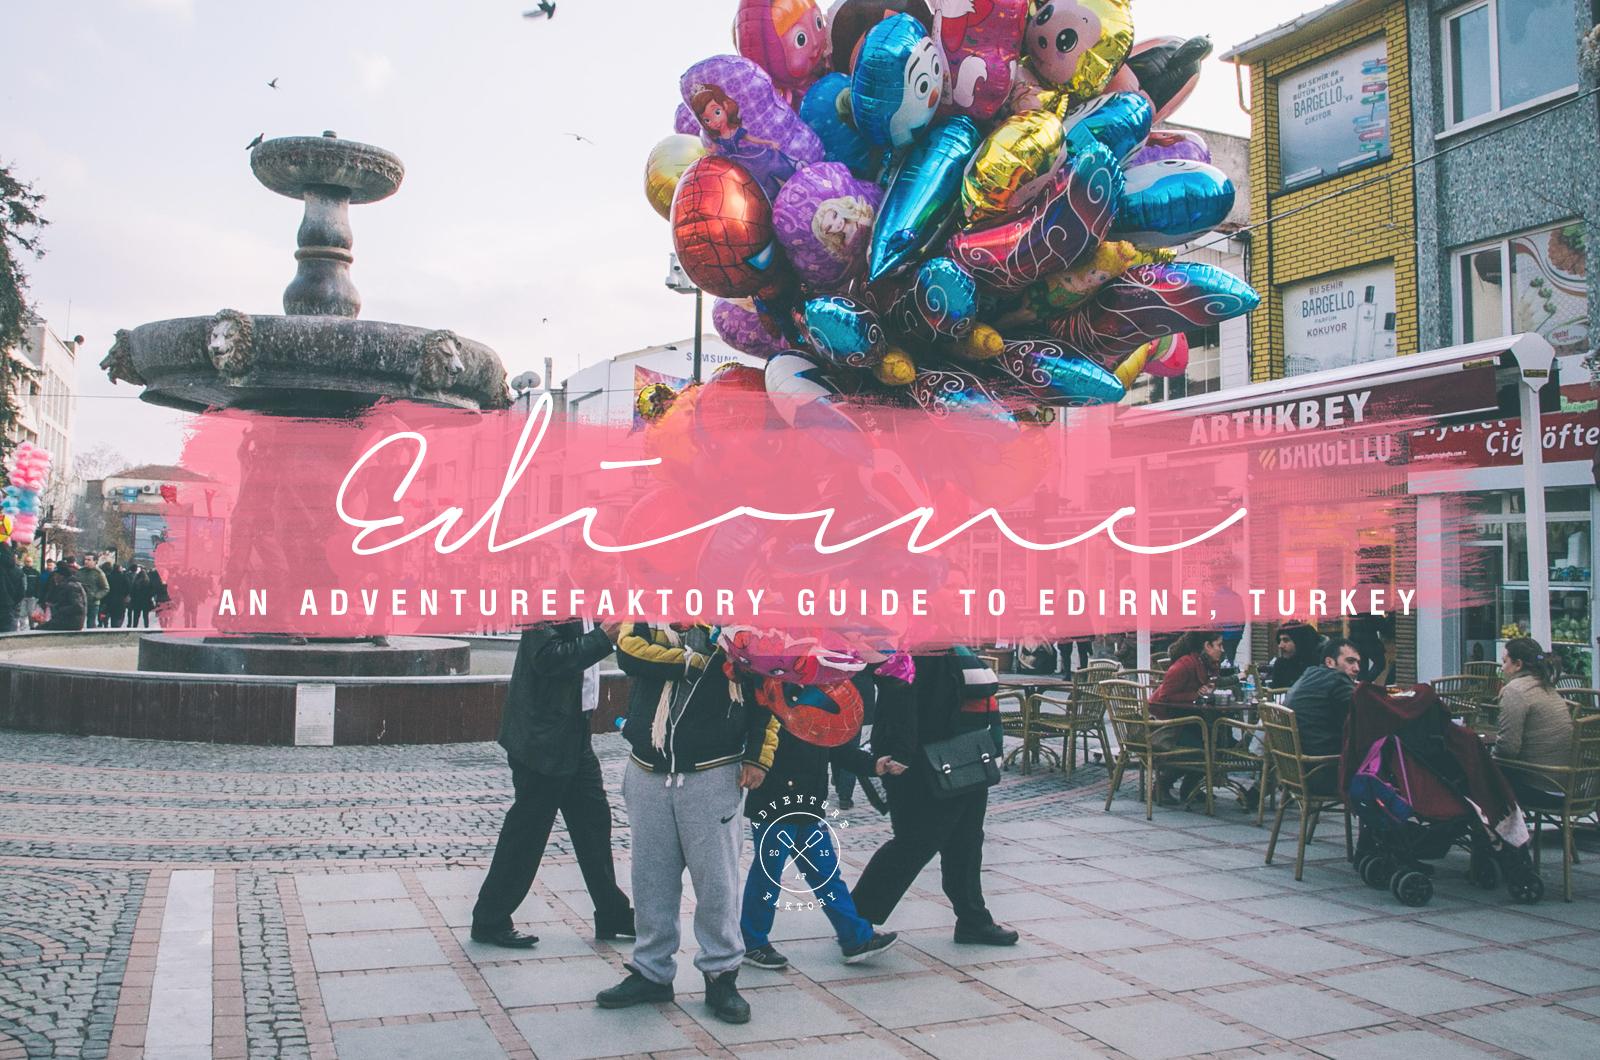 AdventureFaktory Guide to Edirne